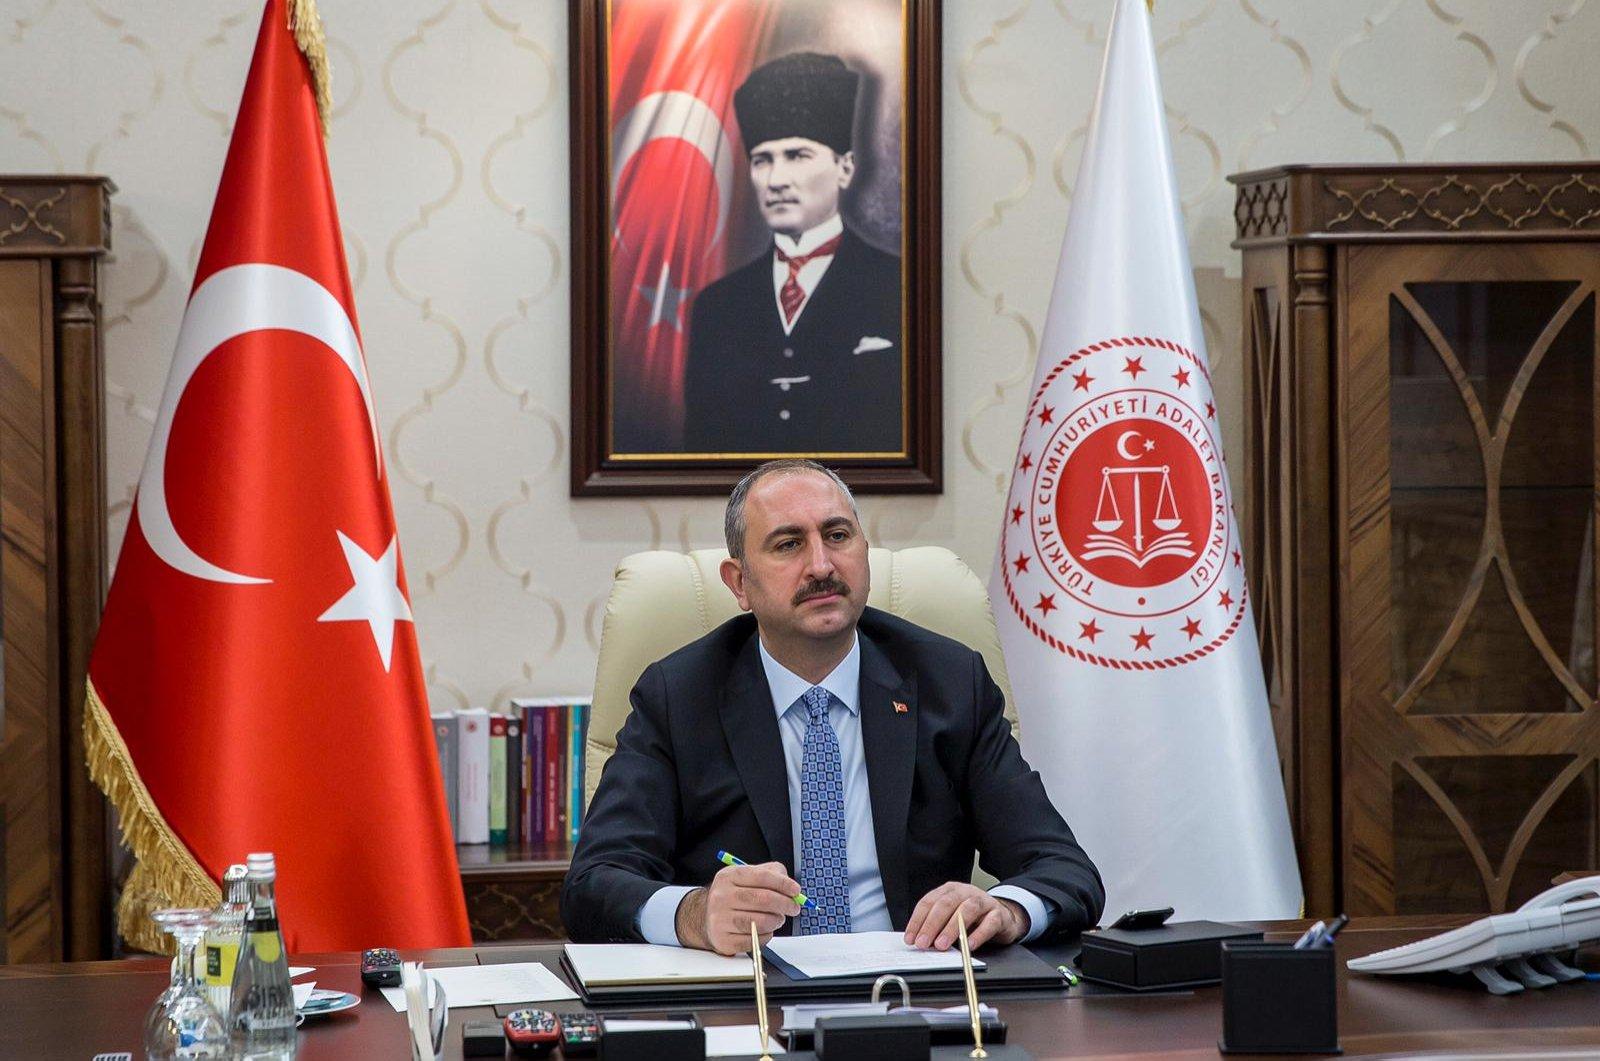 Justice Minister Abdulhamit Gül speaks in this undated photo, Ankara, Turkey. (DHA Photo)